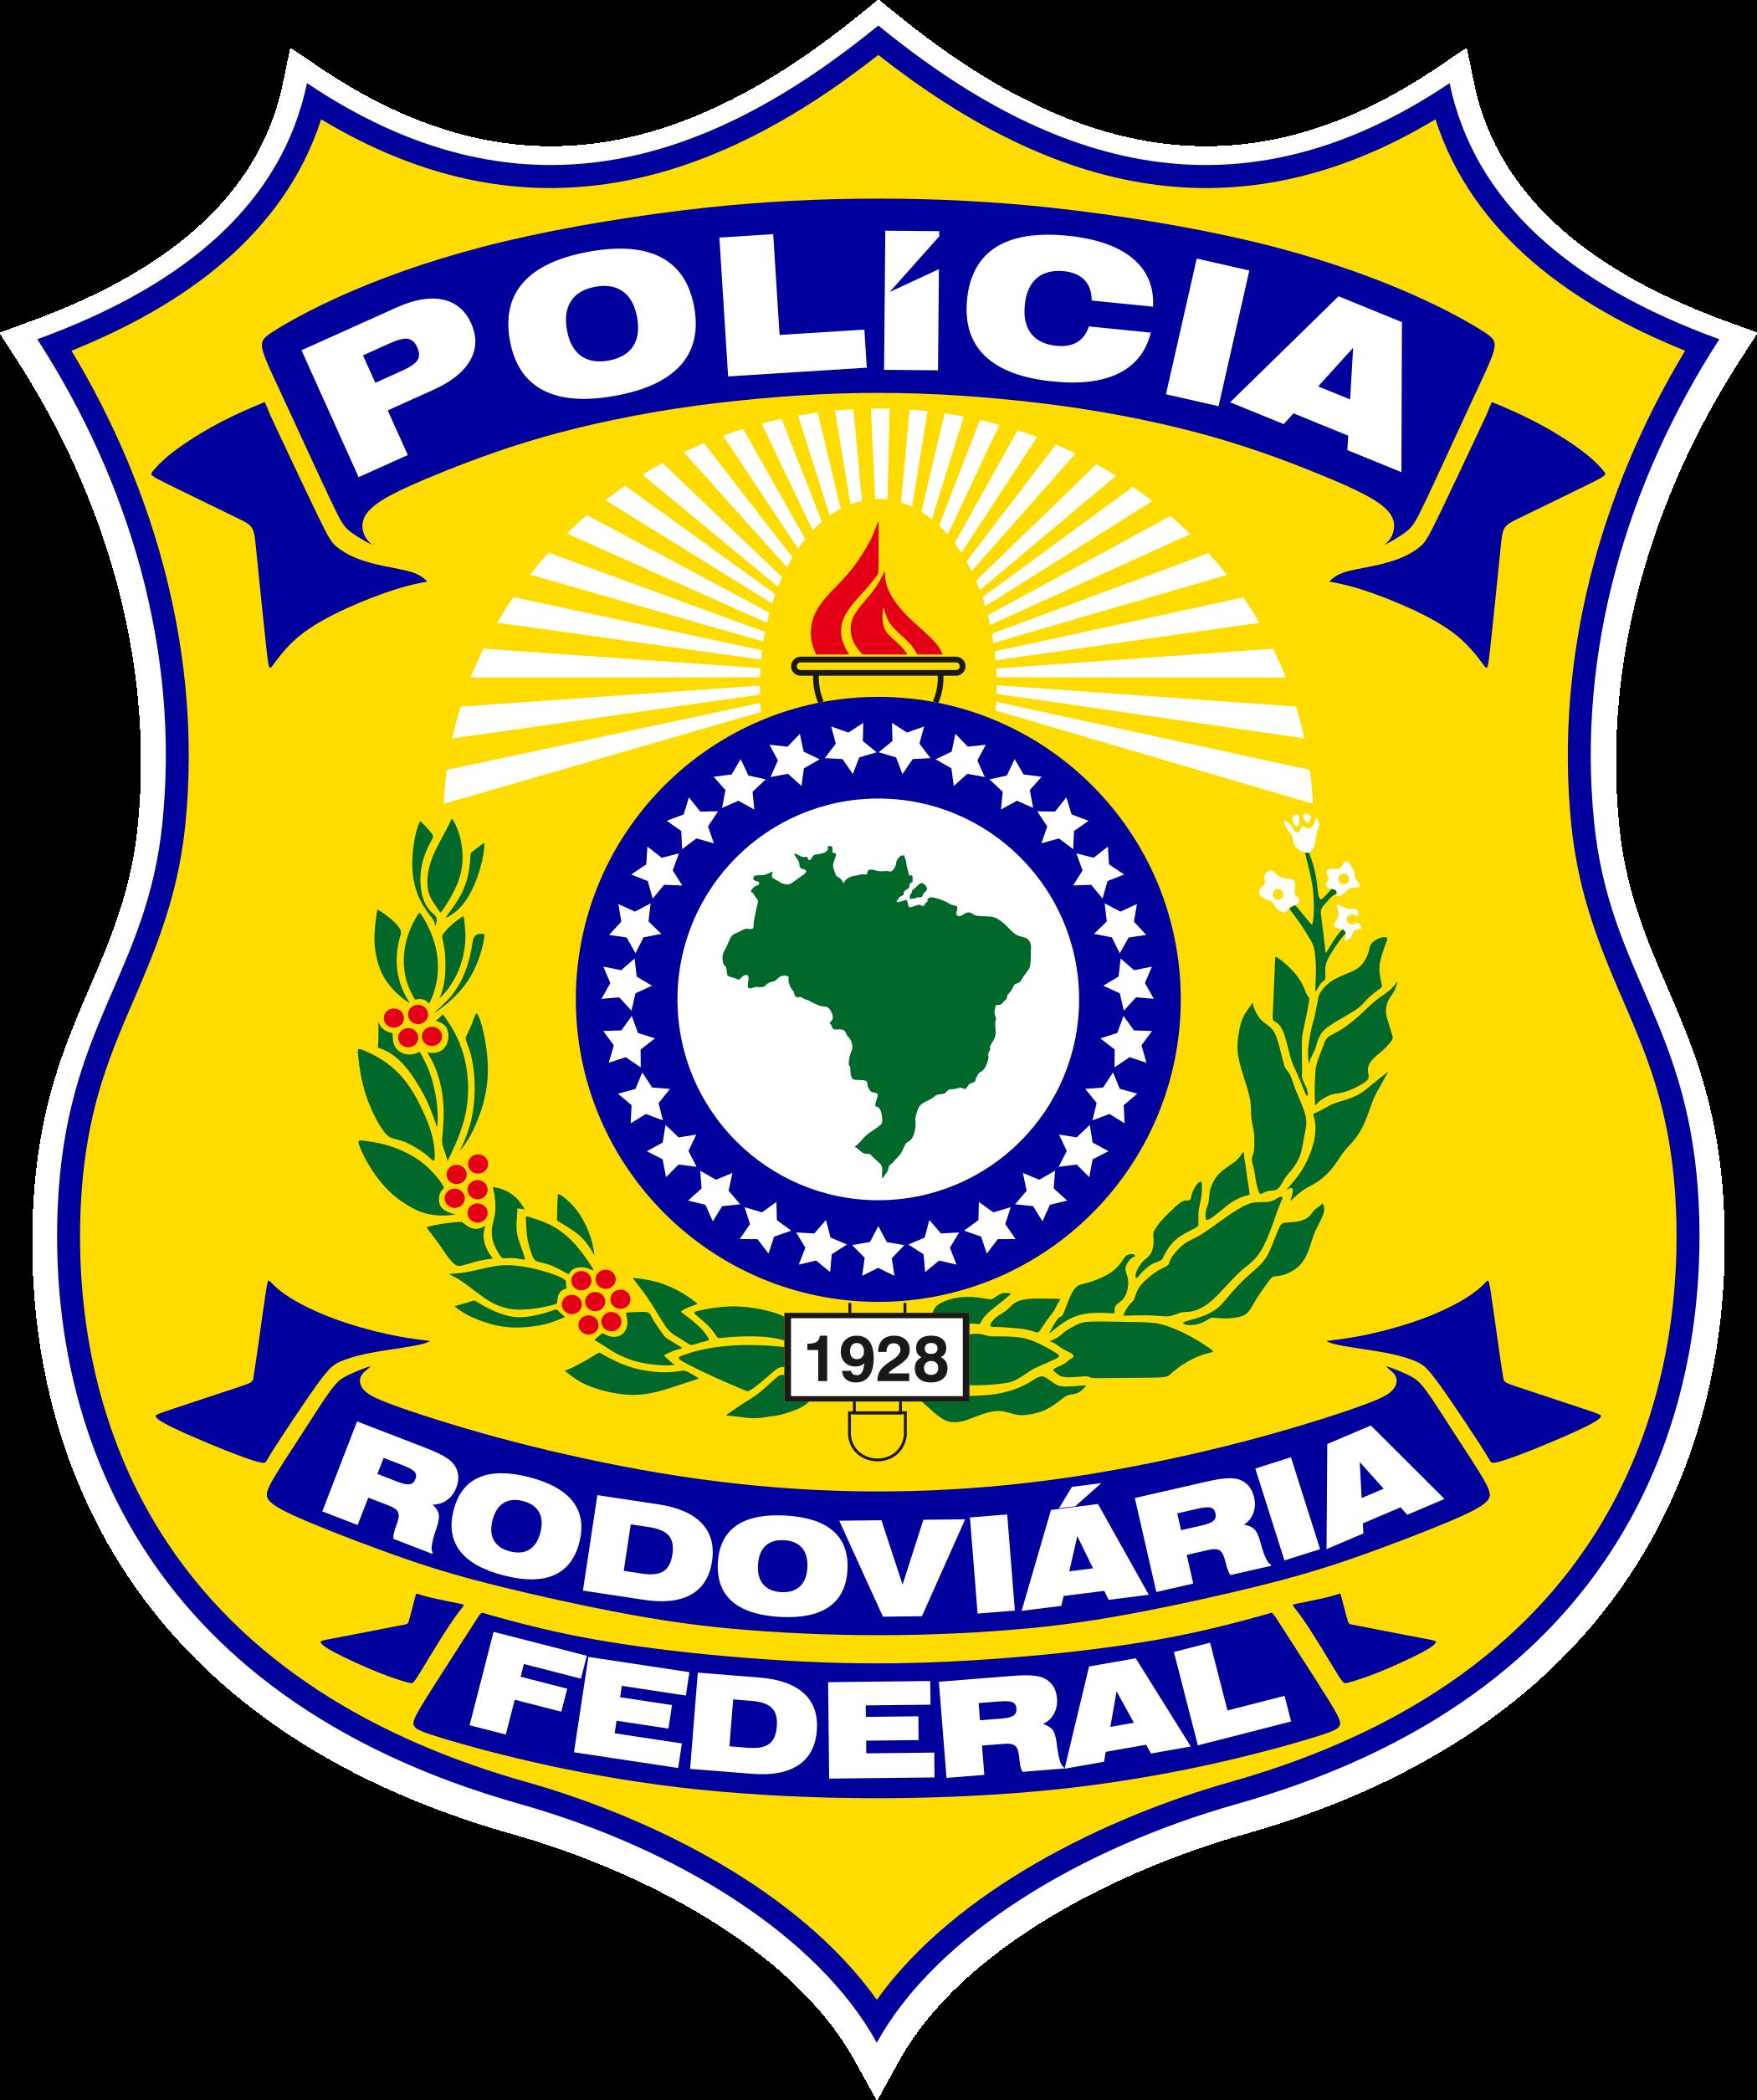 Policia rodoviária federal logo.